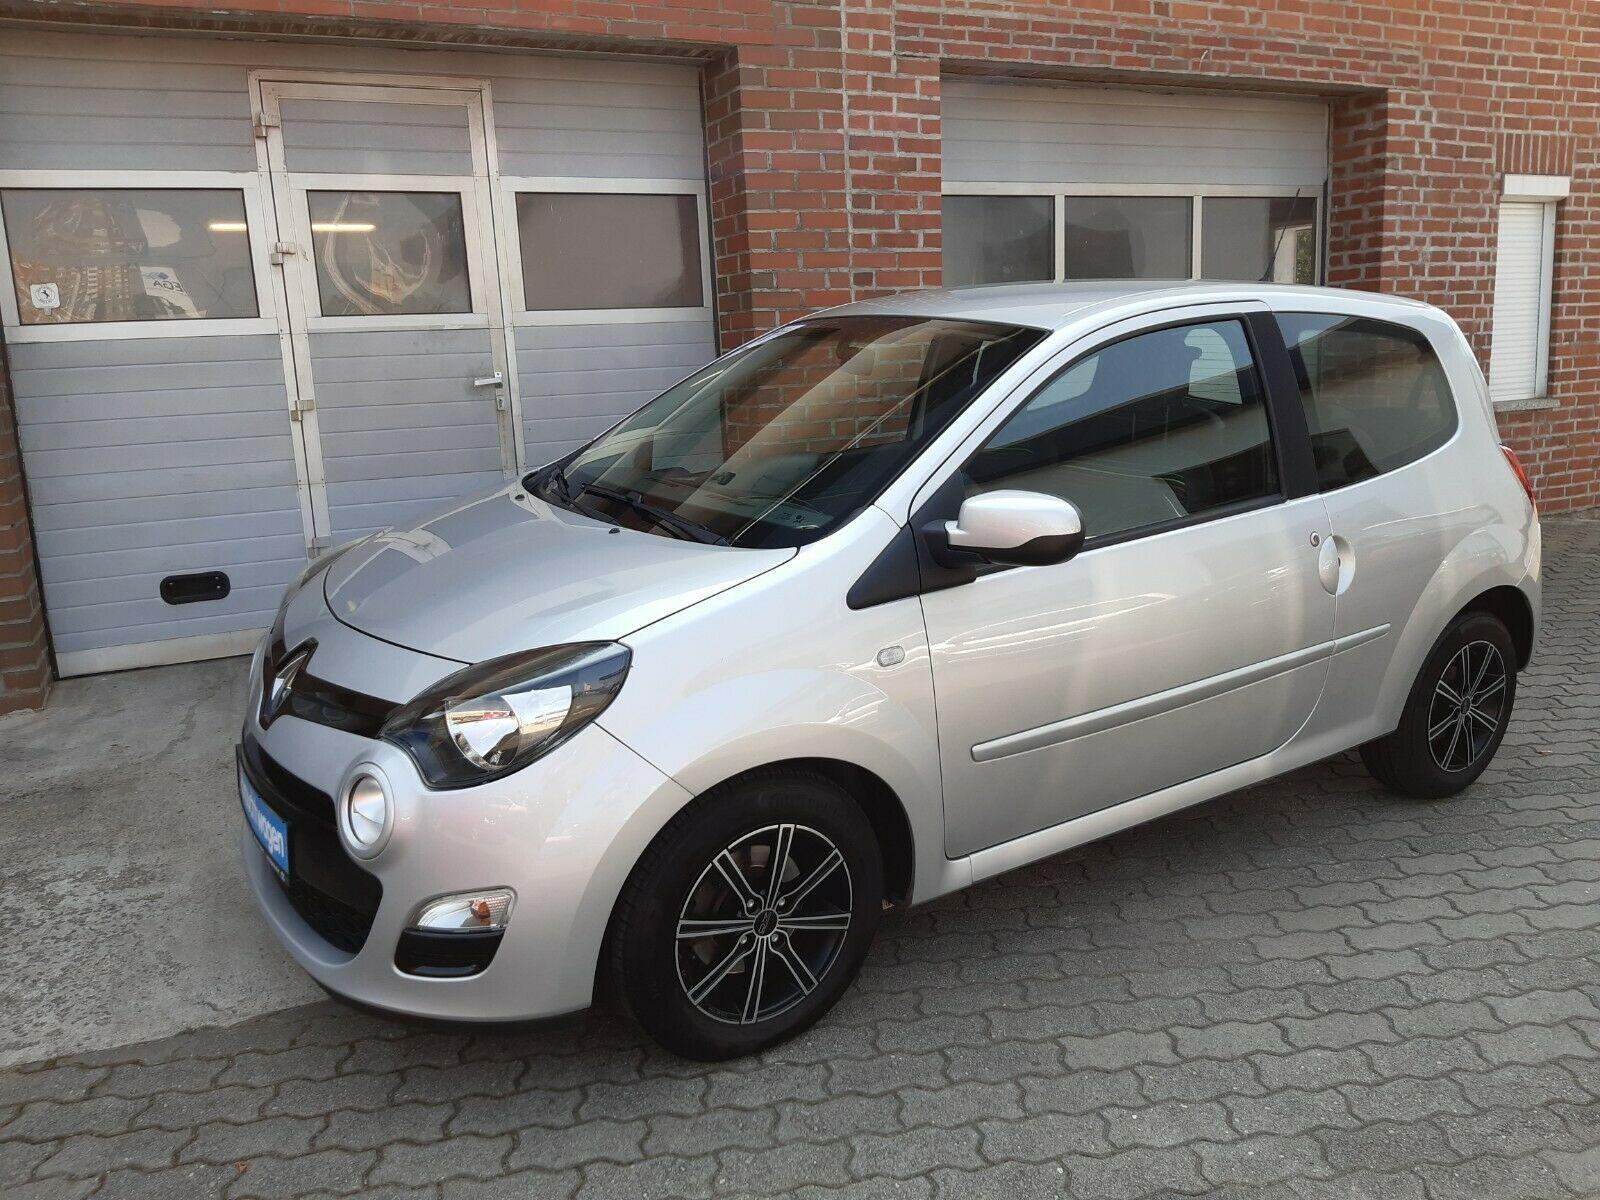 Renault Twingo 1.2 3T